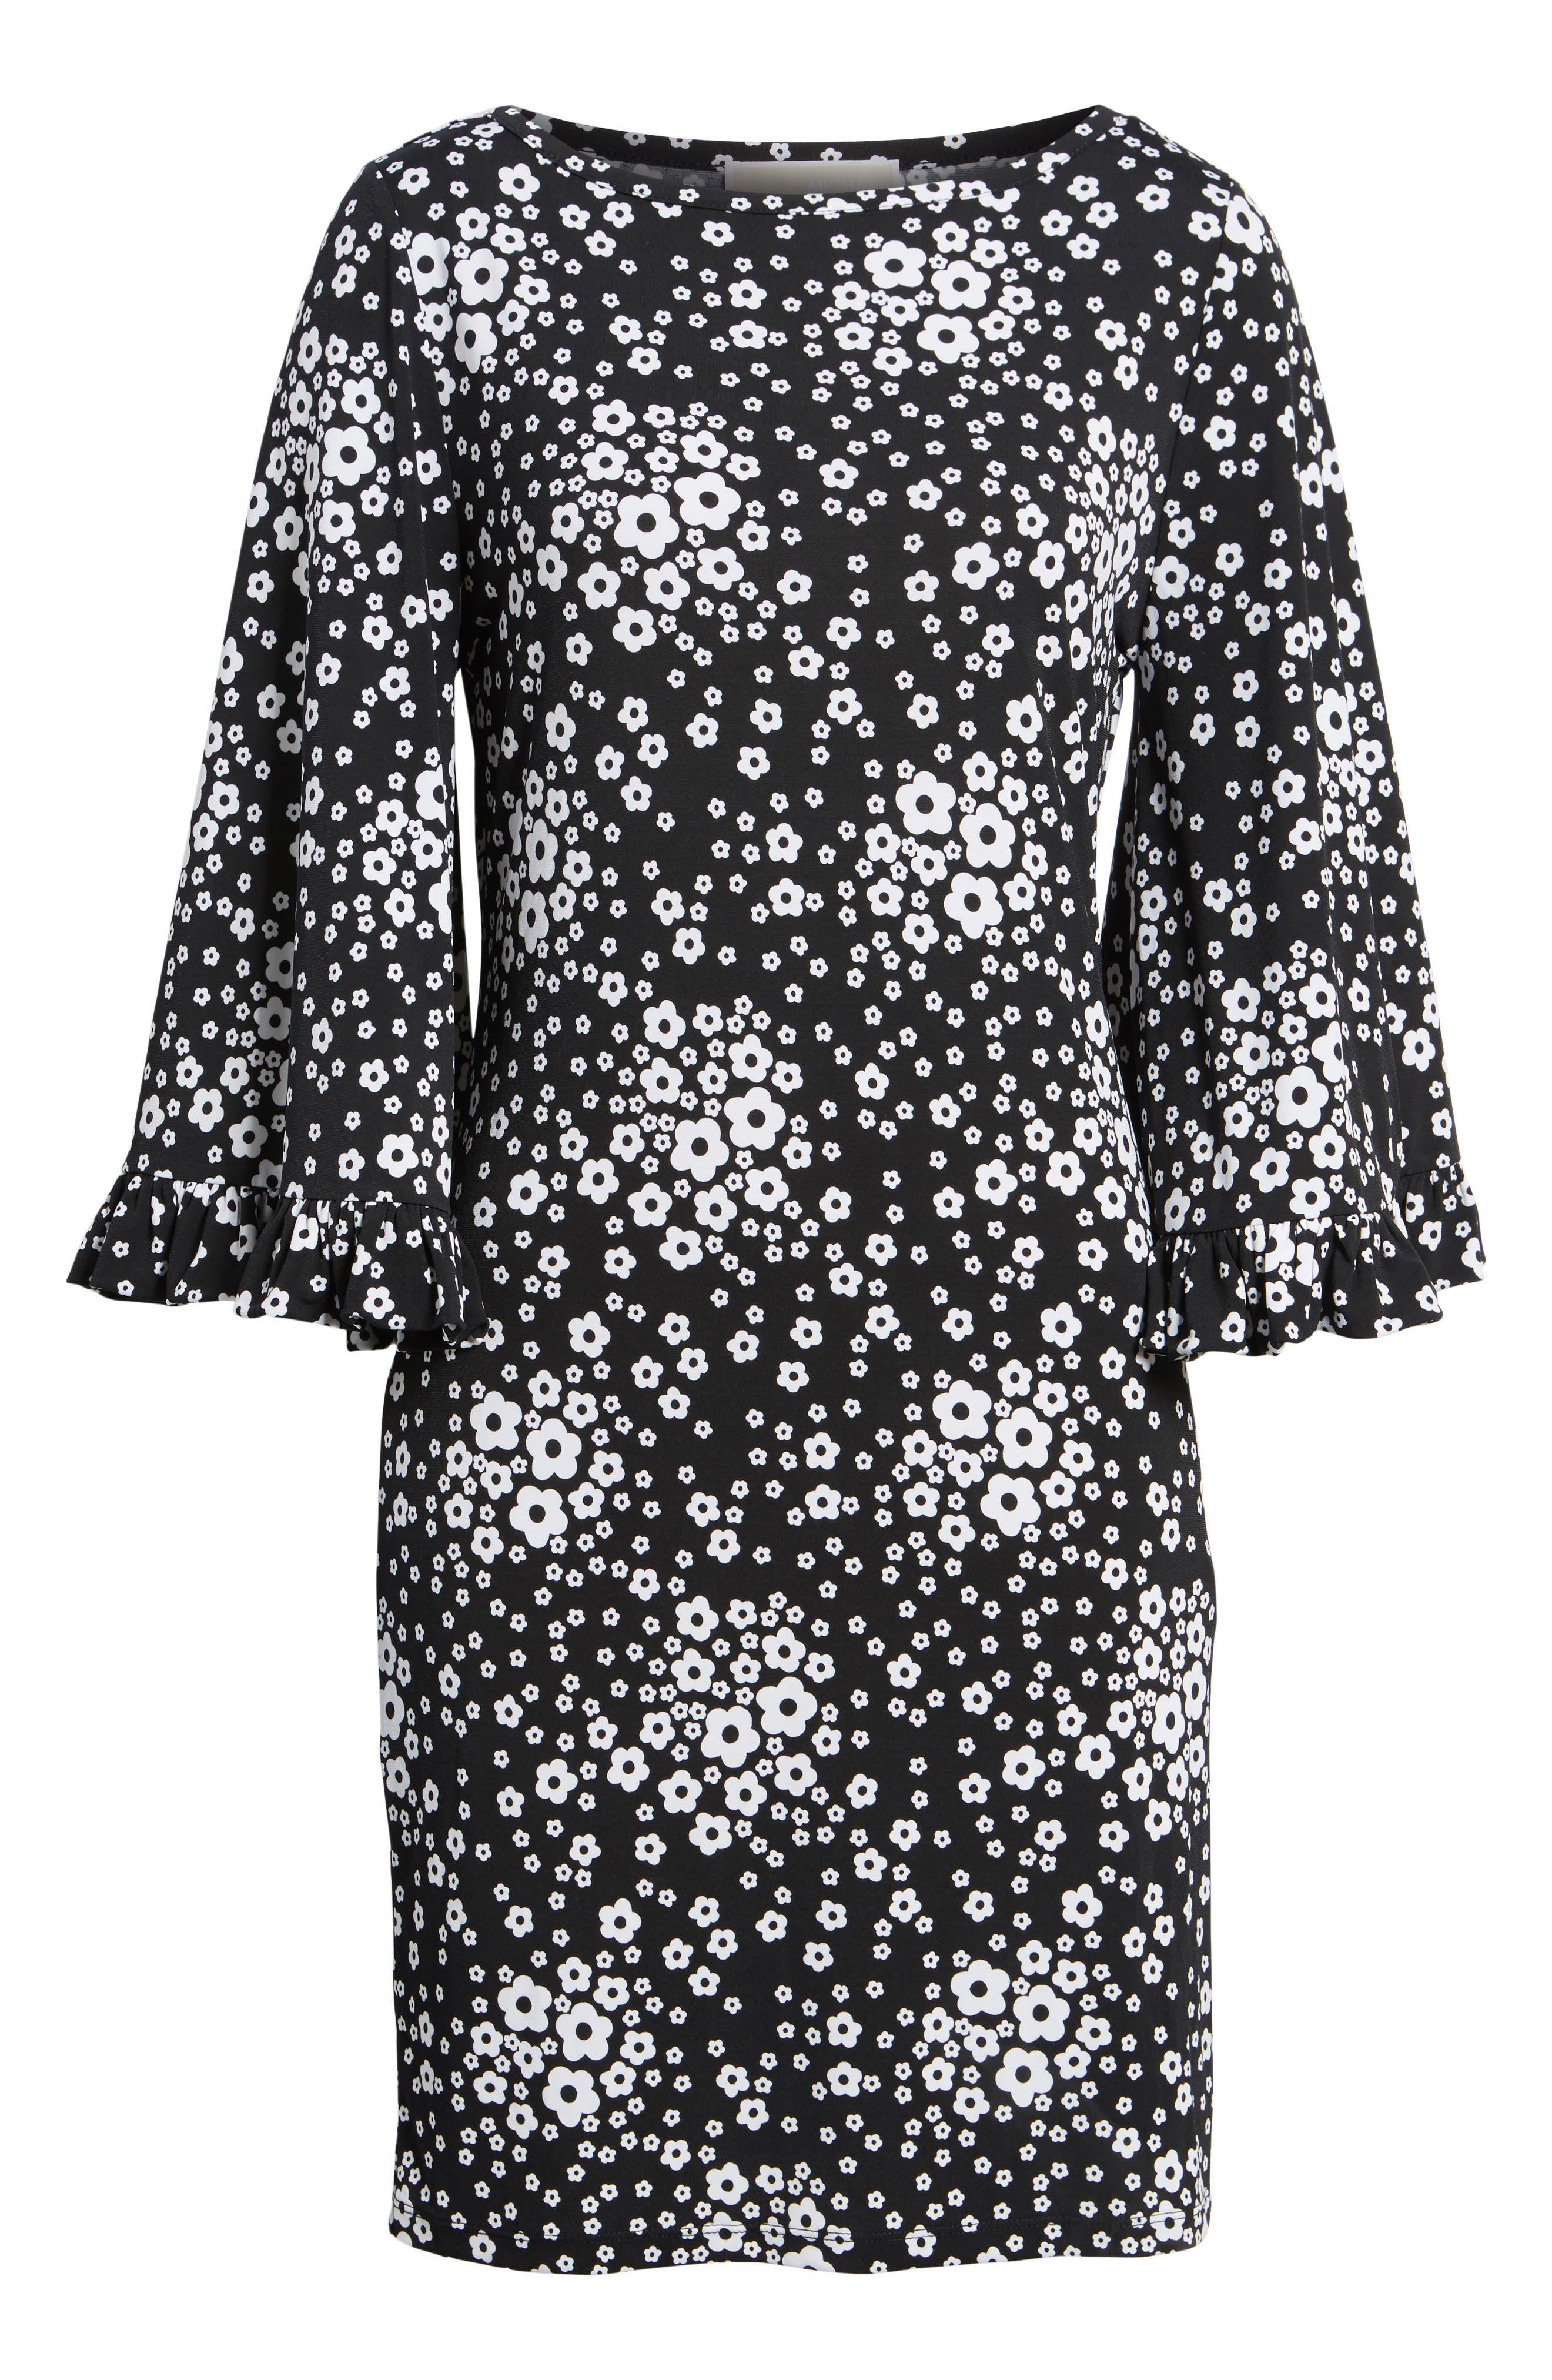 Floral Mod Shift Dress,                             Alternate thumbnail 6, color,                             Black/ White